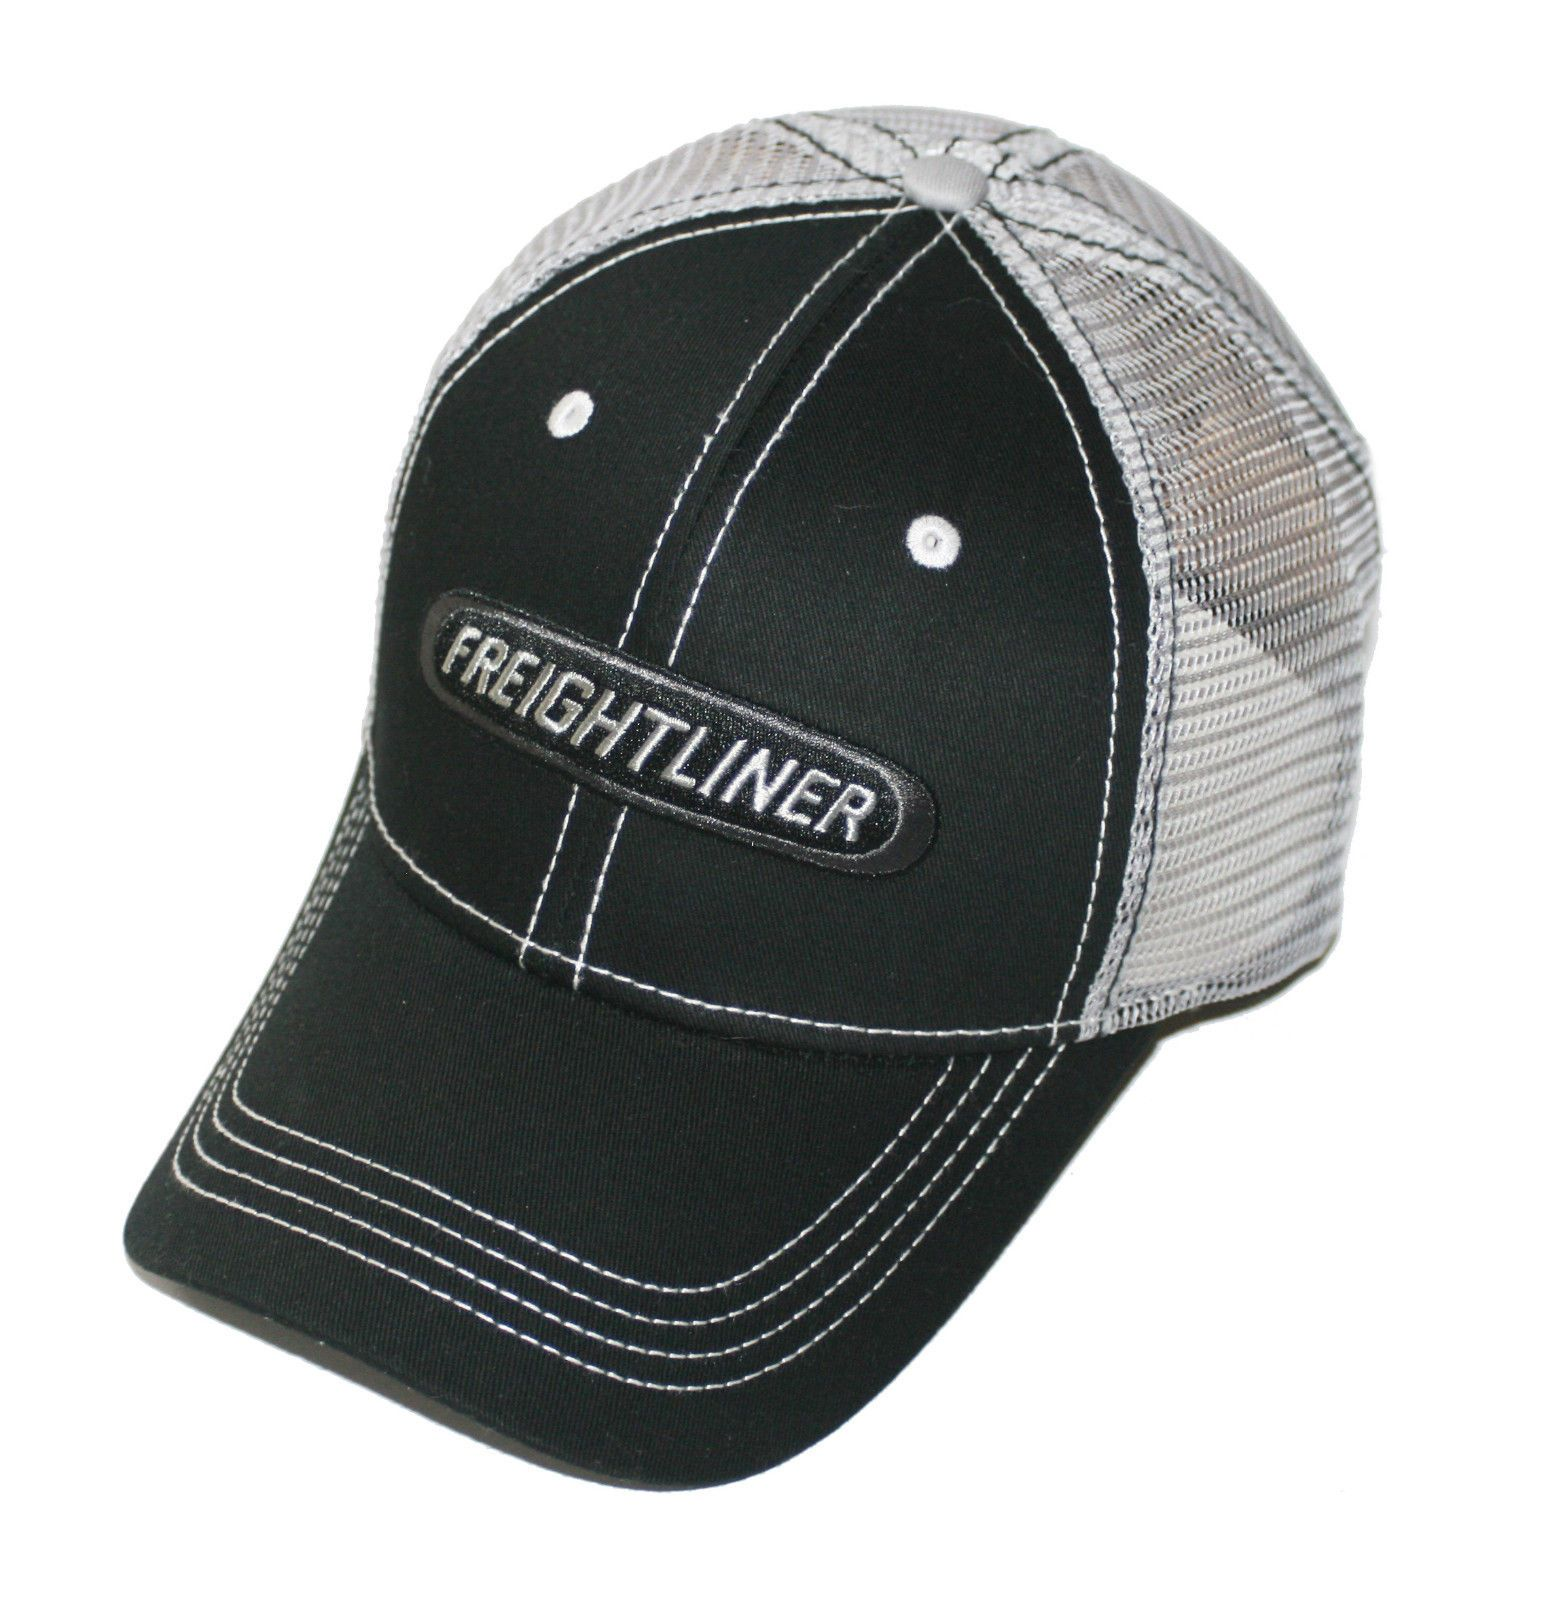 d4cdf89df91fb Freightliner Merchandise - Freightliner Mesh Back Black Hats - Freightliner  Caps